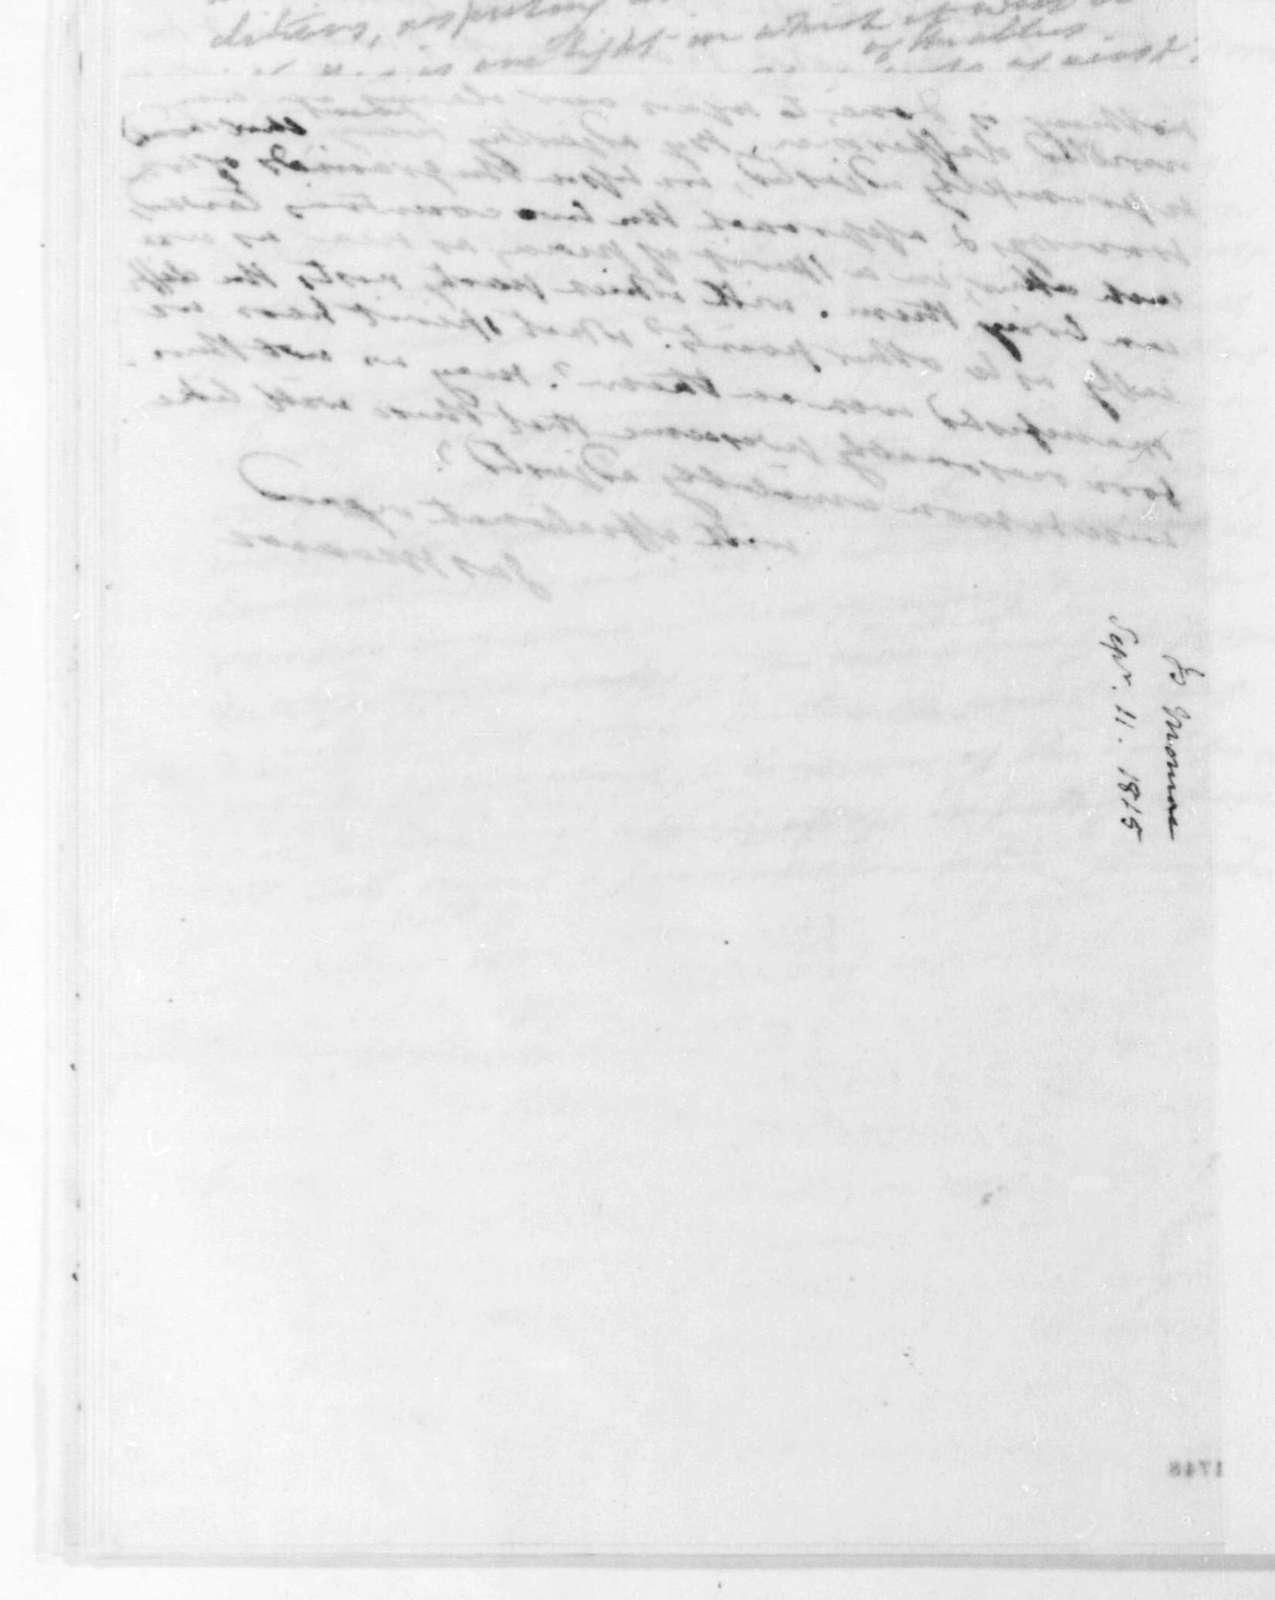 James Monroe to James Madison, September 11, 1815.